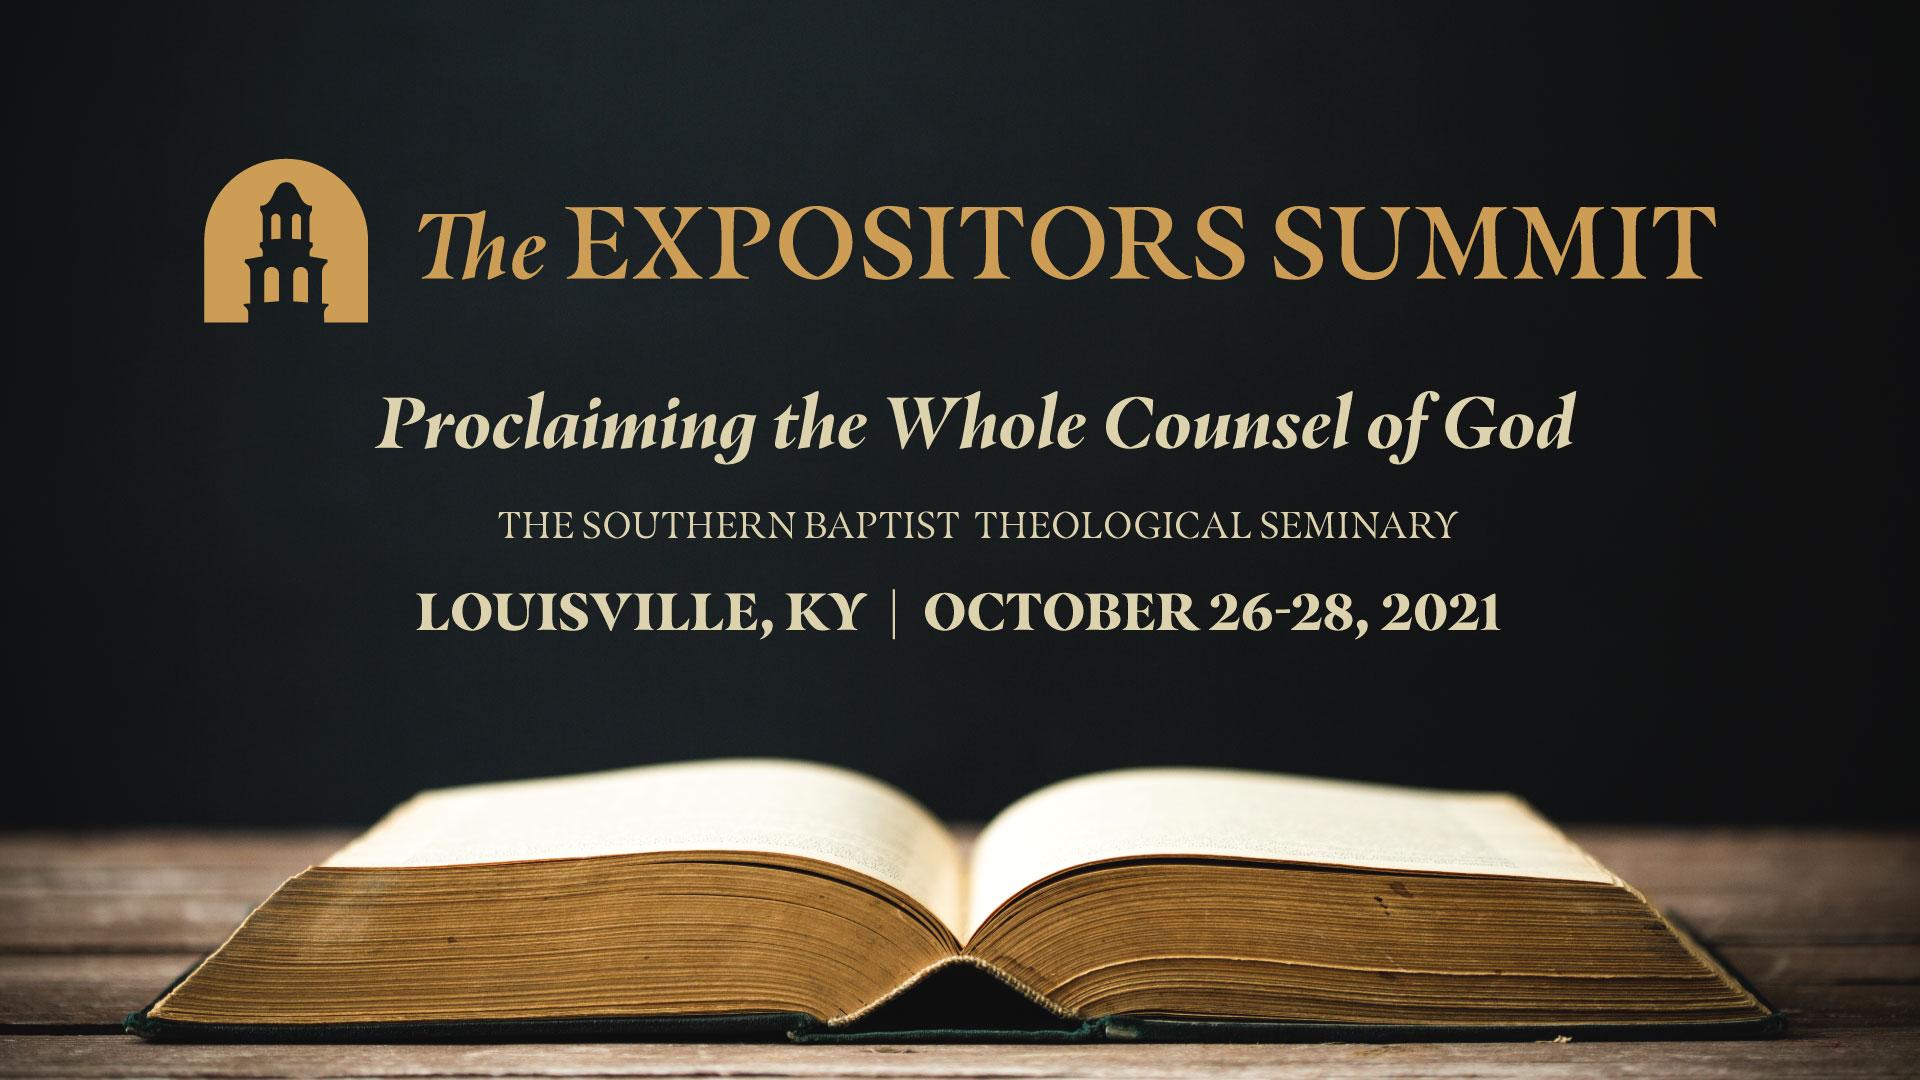 The Expositors Summit